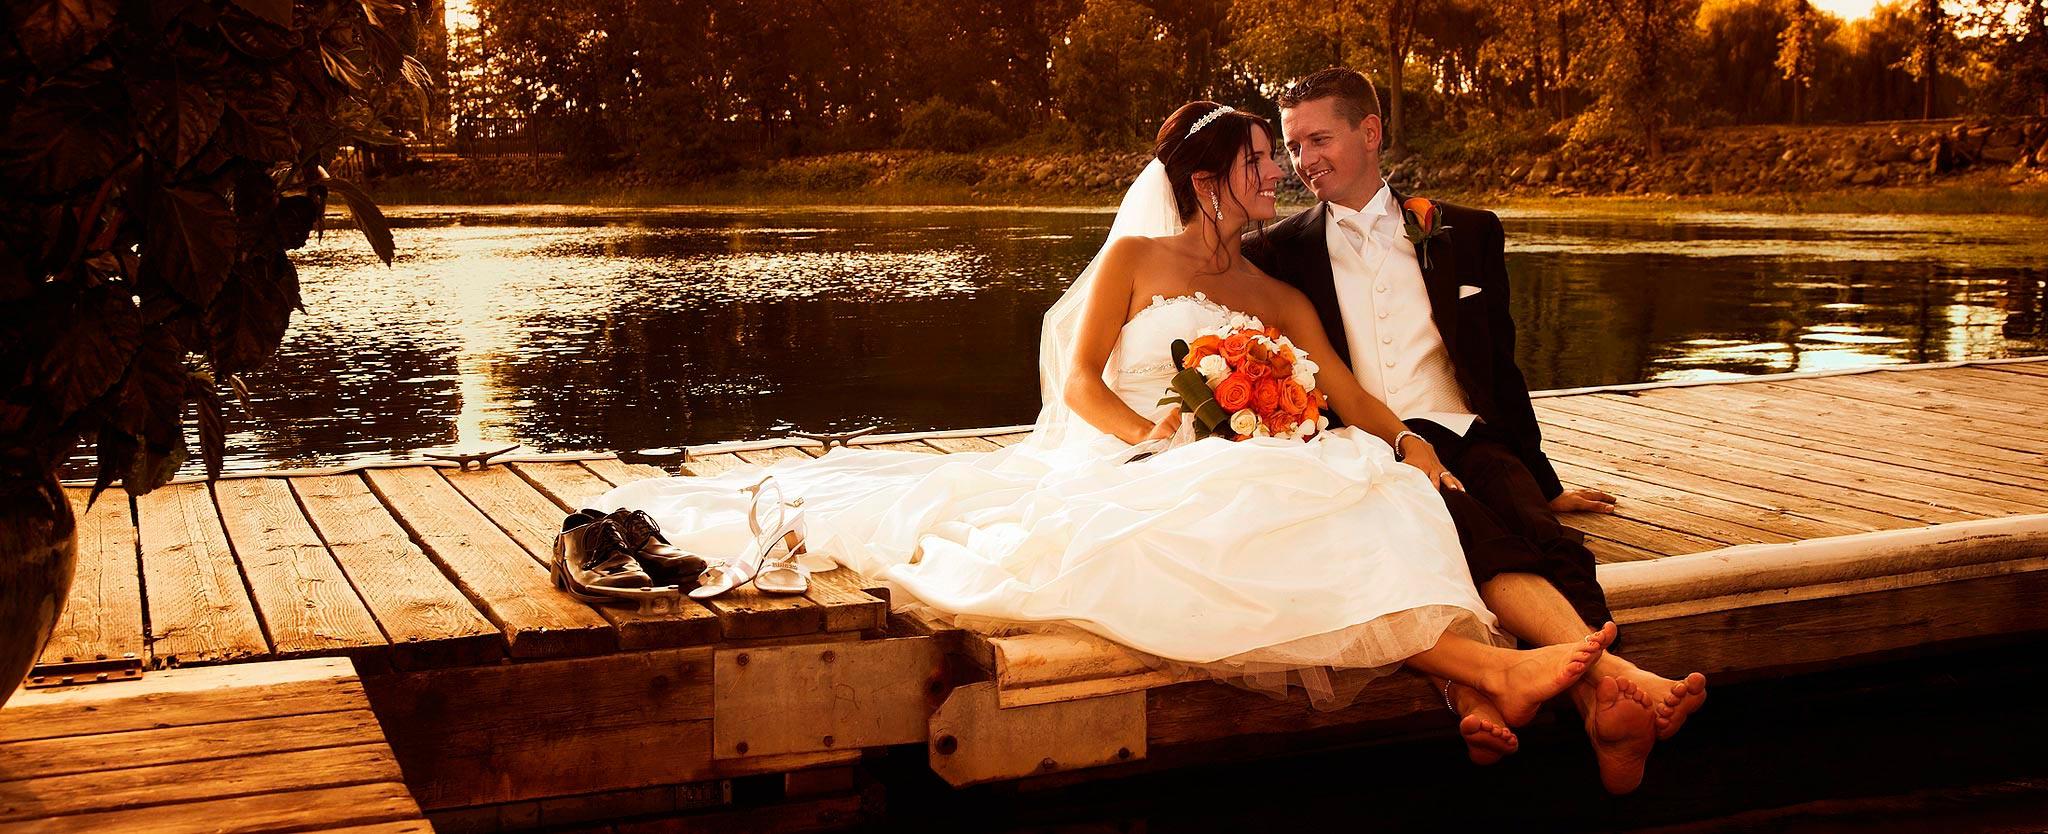 photographe-mariage-couple-quai-chateau-vaudreuil-stephane-lariviere-photo-photographie-rigaud